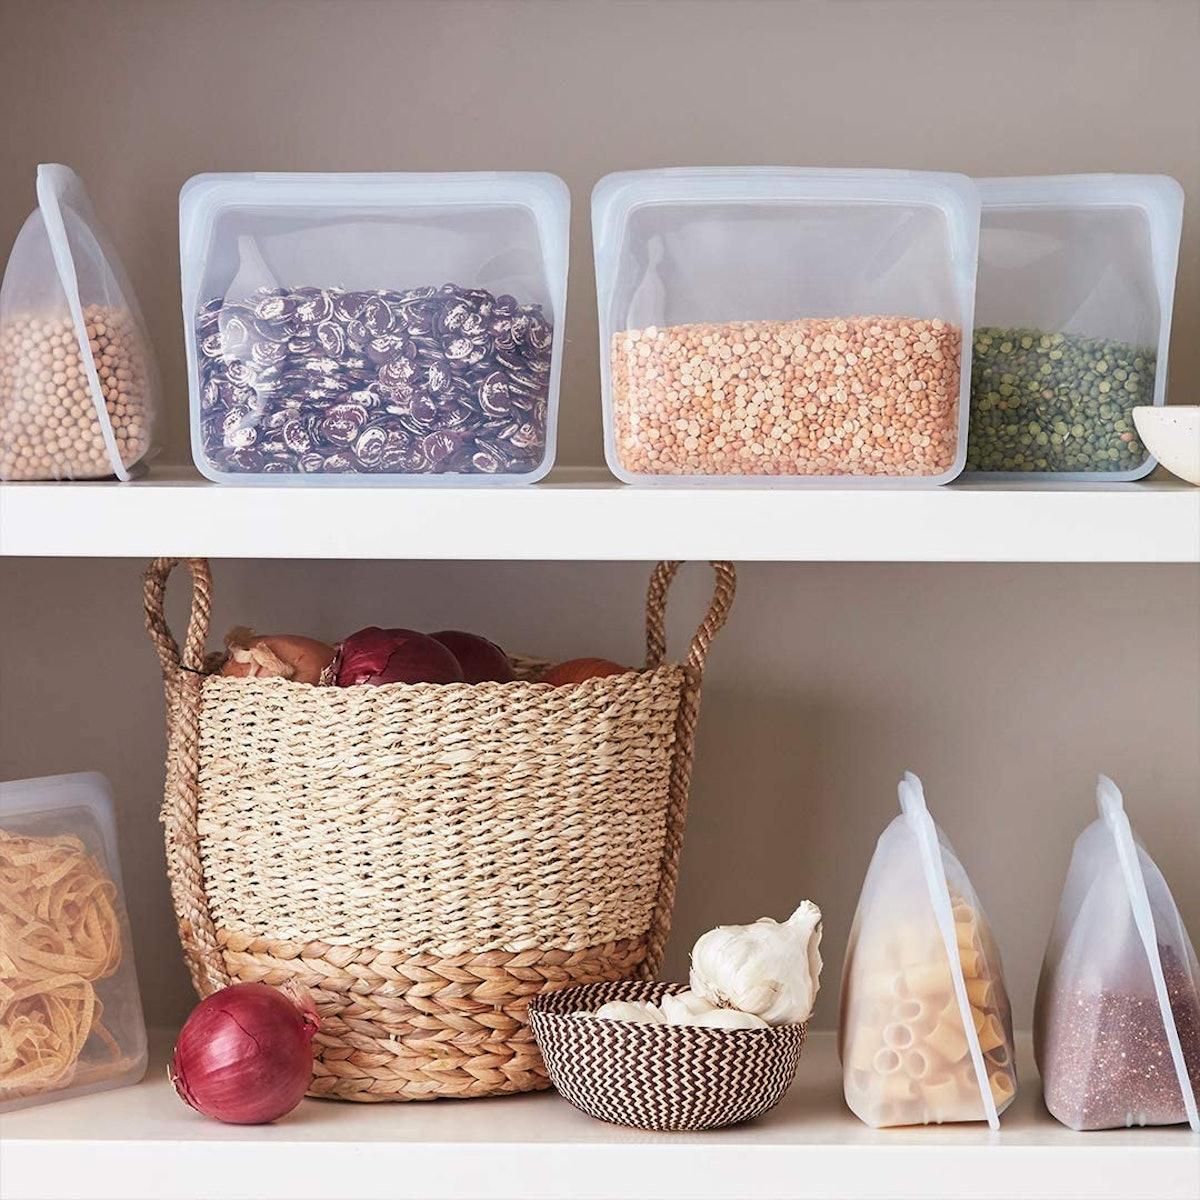 Stasher Platinum Silicone Reusable Storage Bag